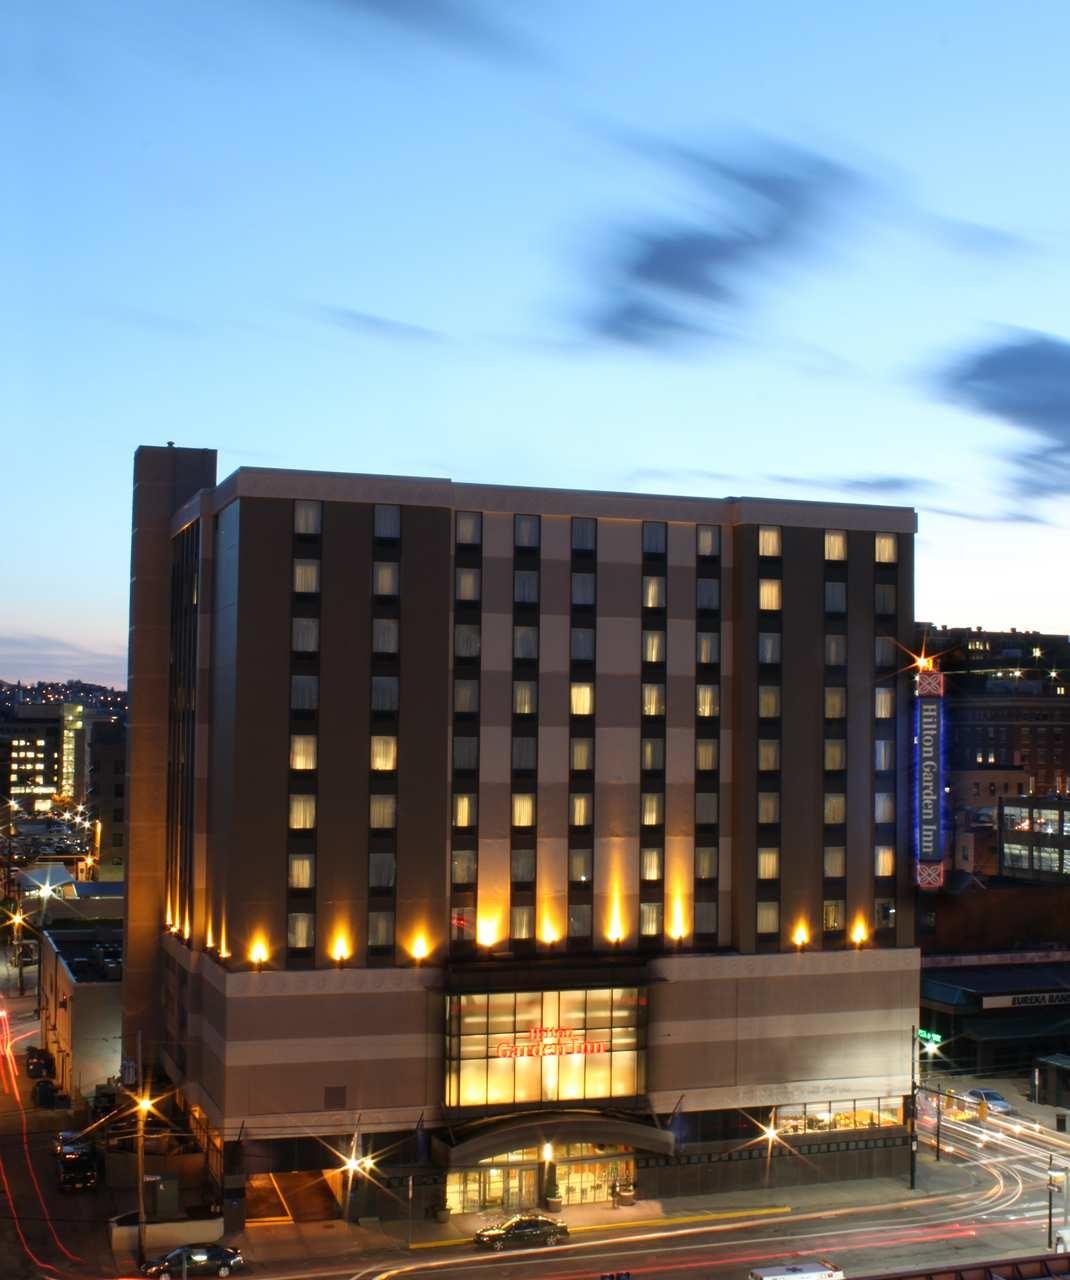 Wyndham Garden Hotel Pittsburgh University Place